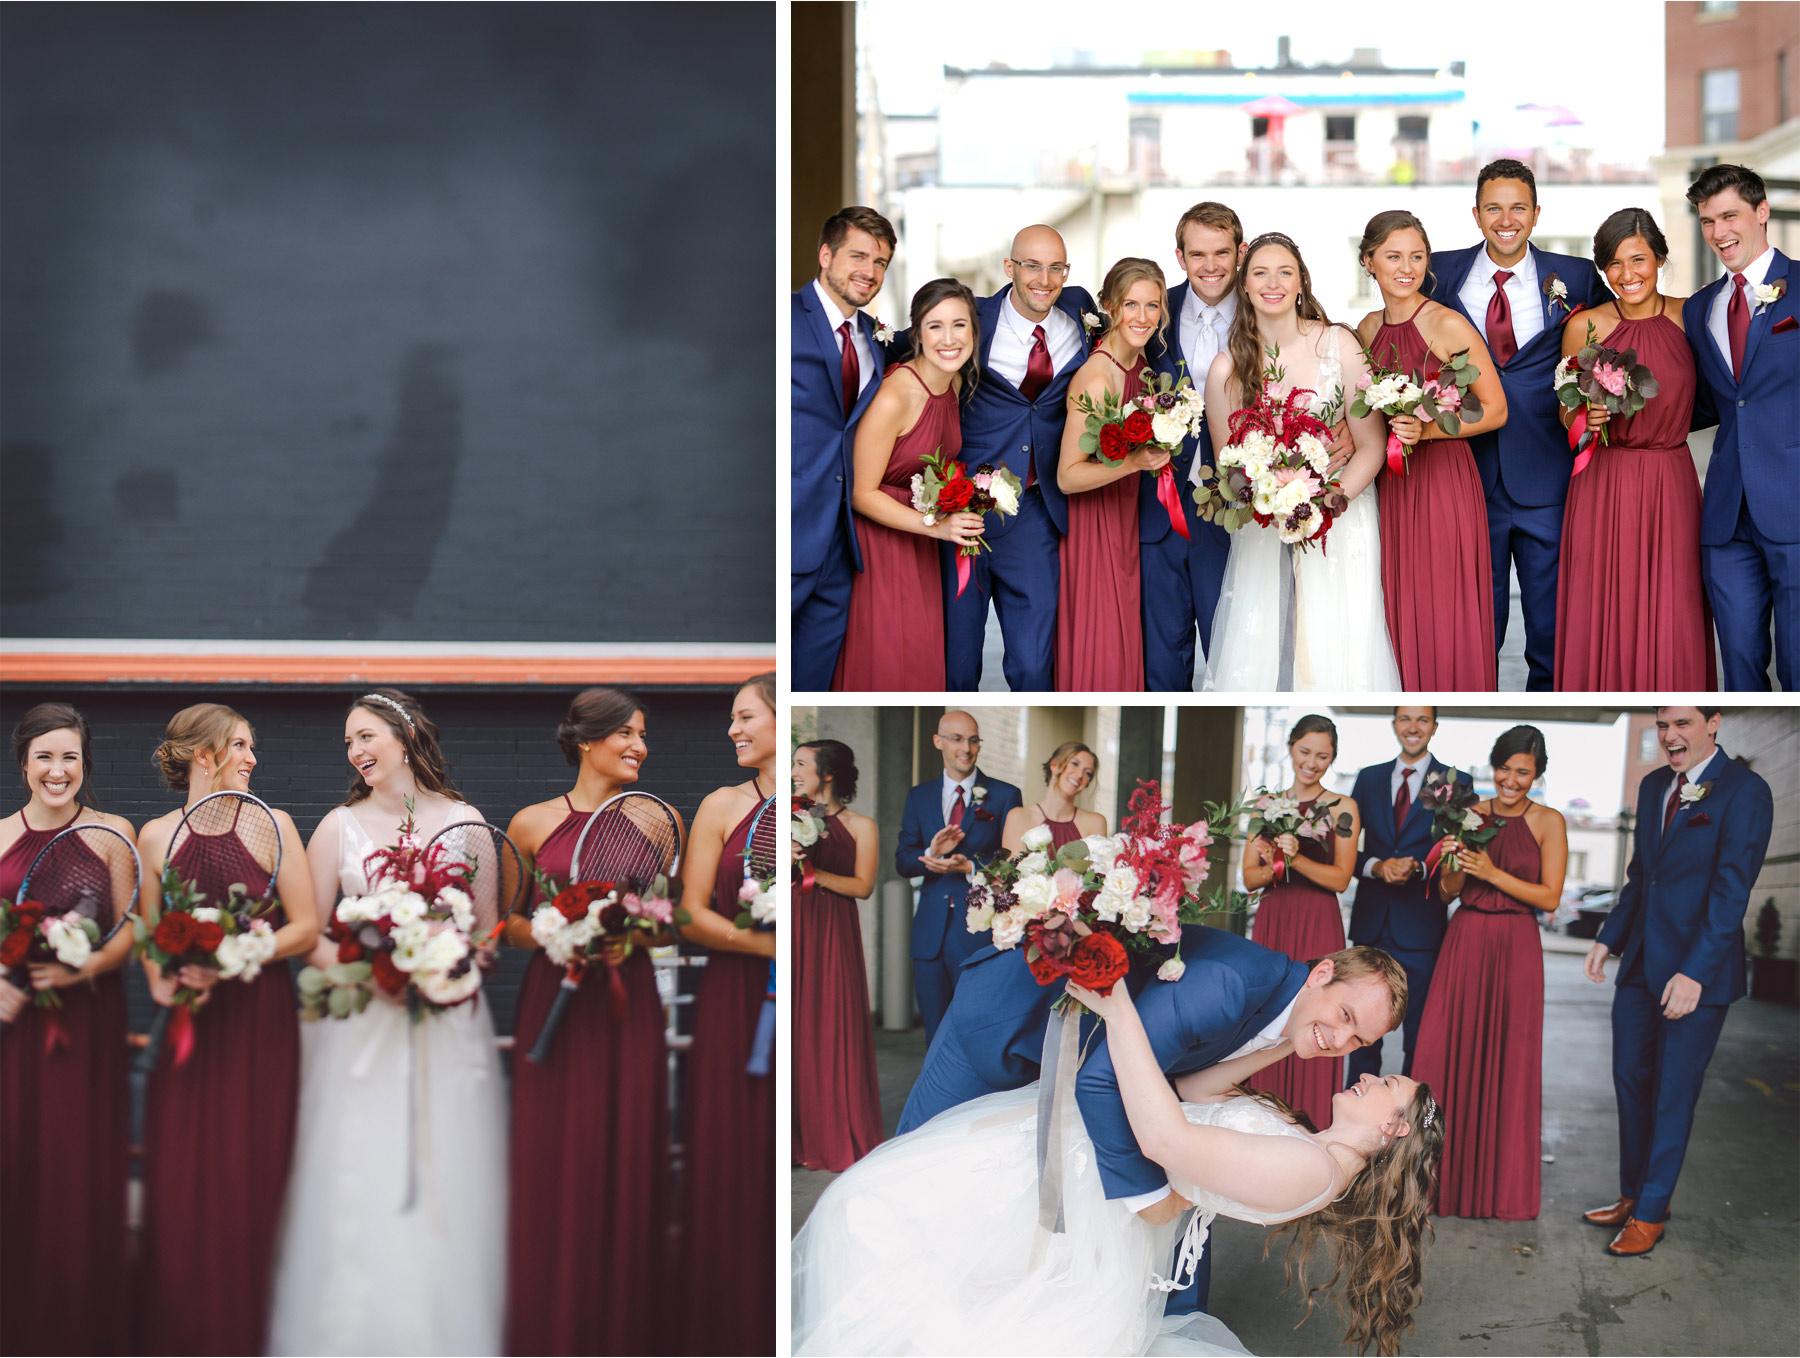 12-Saint-Paul-Minnesota-Wedding-Photography-by-Vick-Photography-Saint-Paul-Athletic-Club-Tennis-Group-Wedding-Party-Kelsey-and-Jeffery.jpg